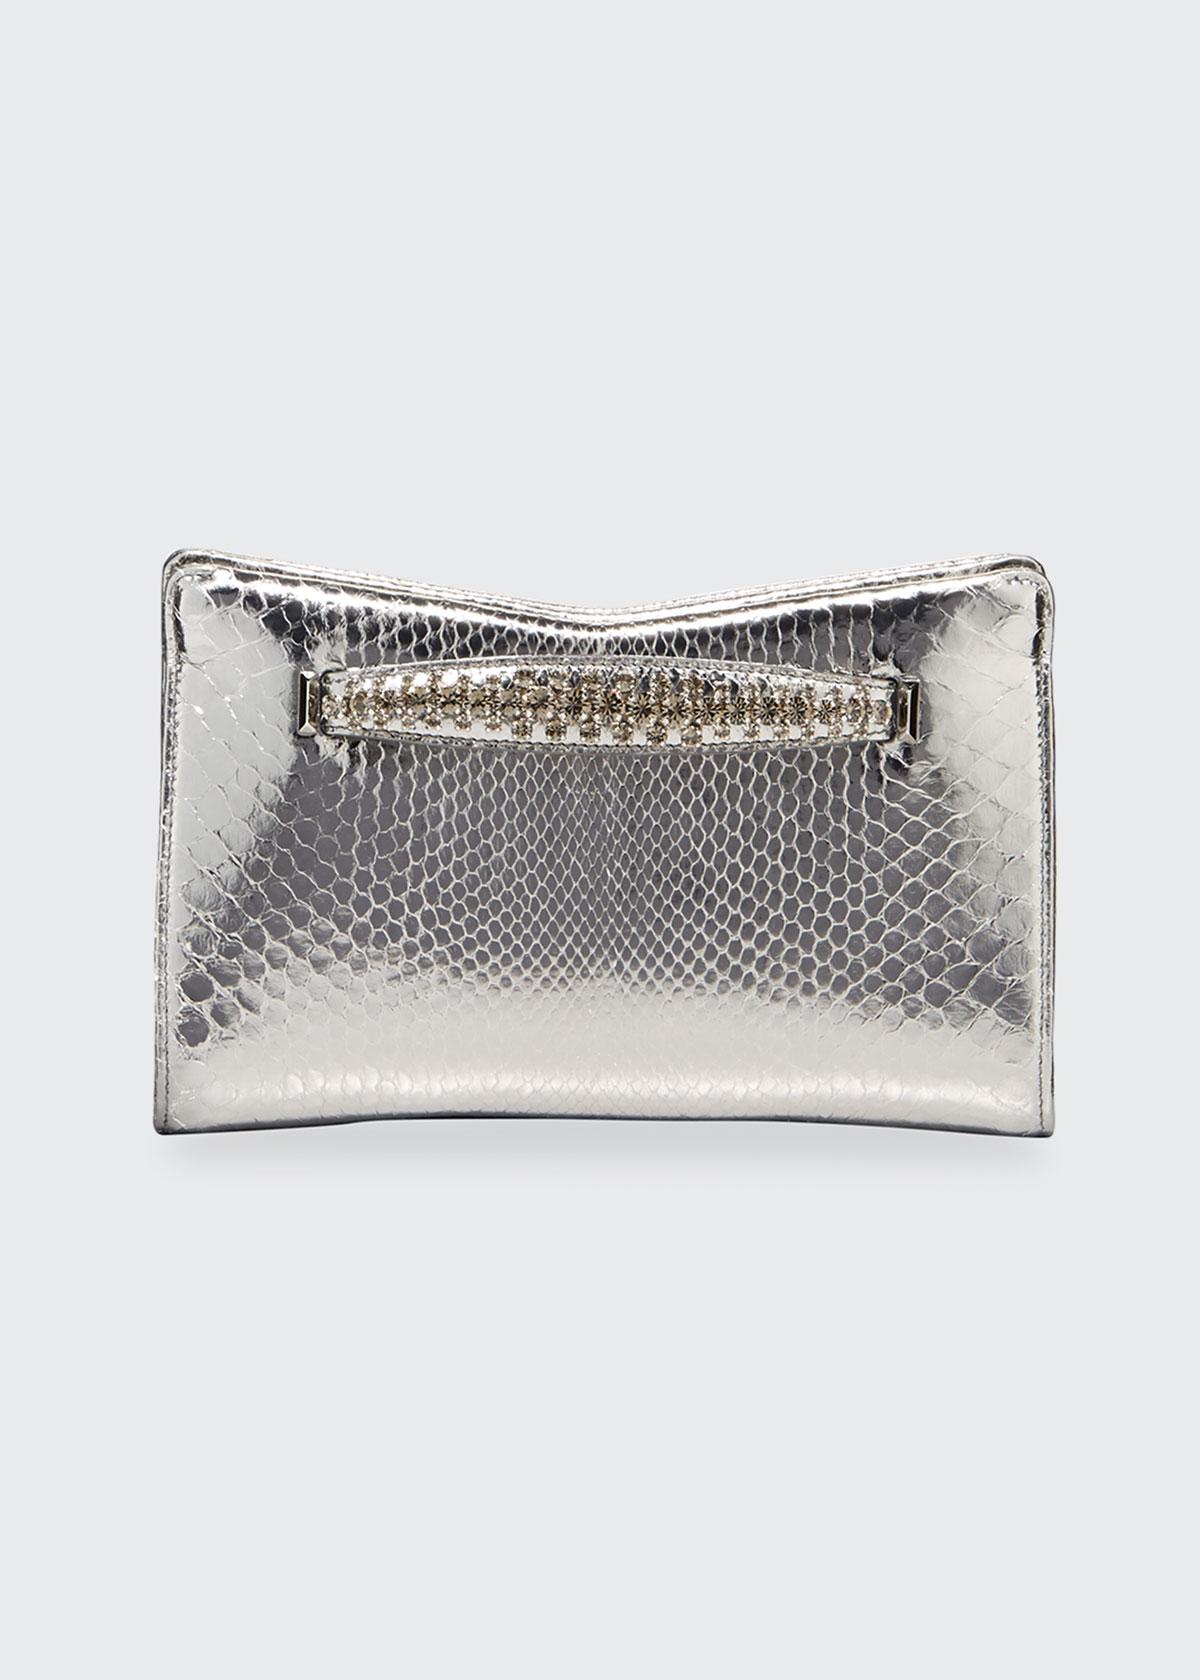 Jimmy Choo Venus Metallic Python Clutch Bag In Gray